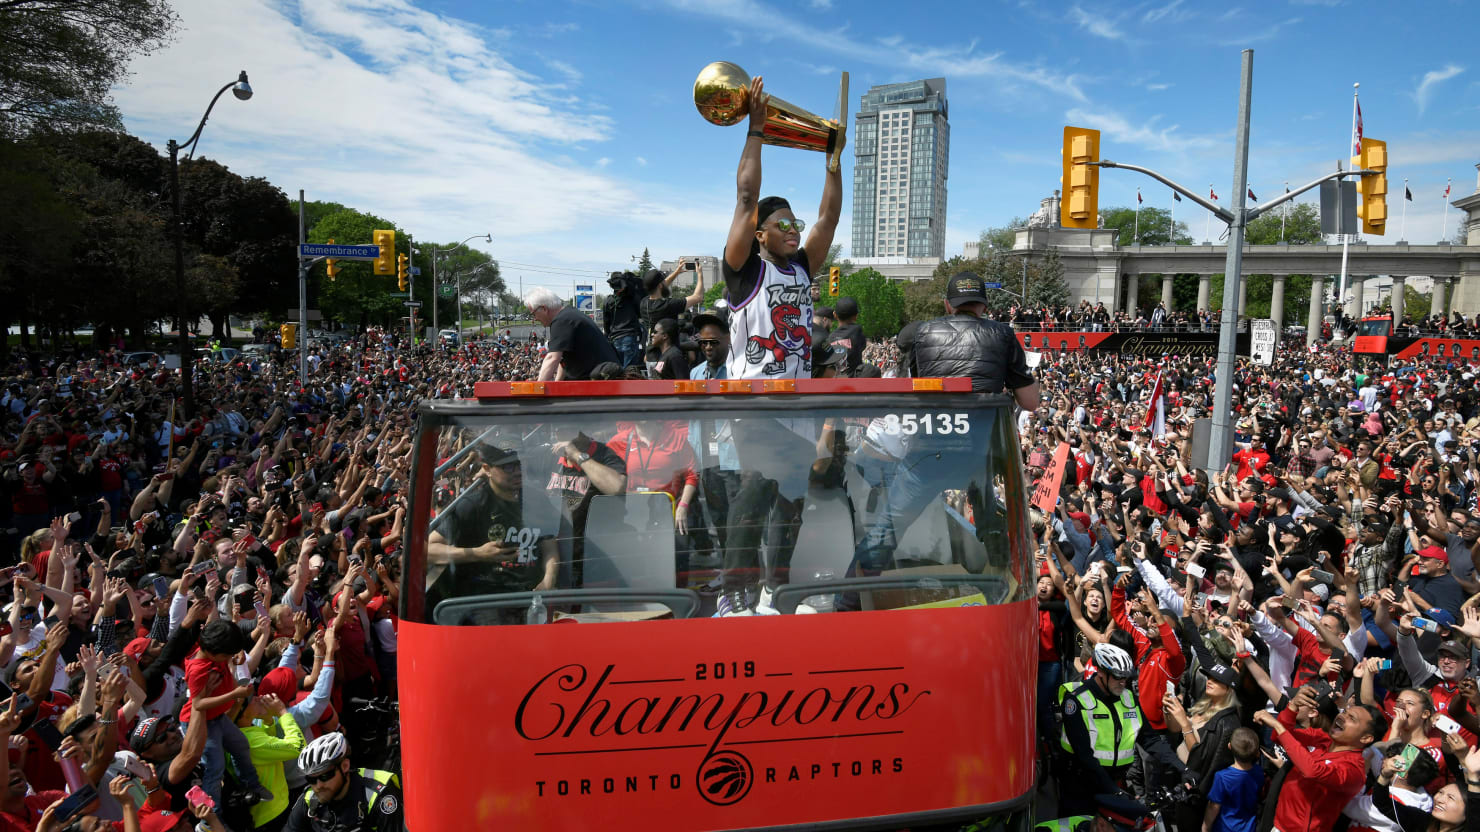 Four Hurt in Shooting During Toronto Raptors' NBA Celebrations